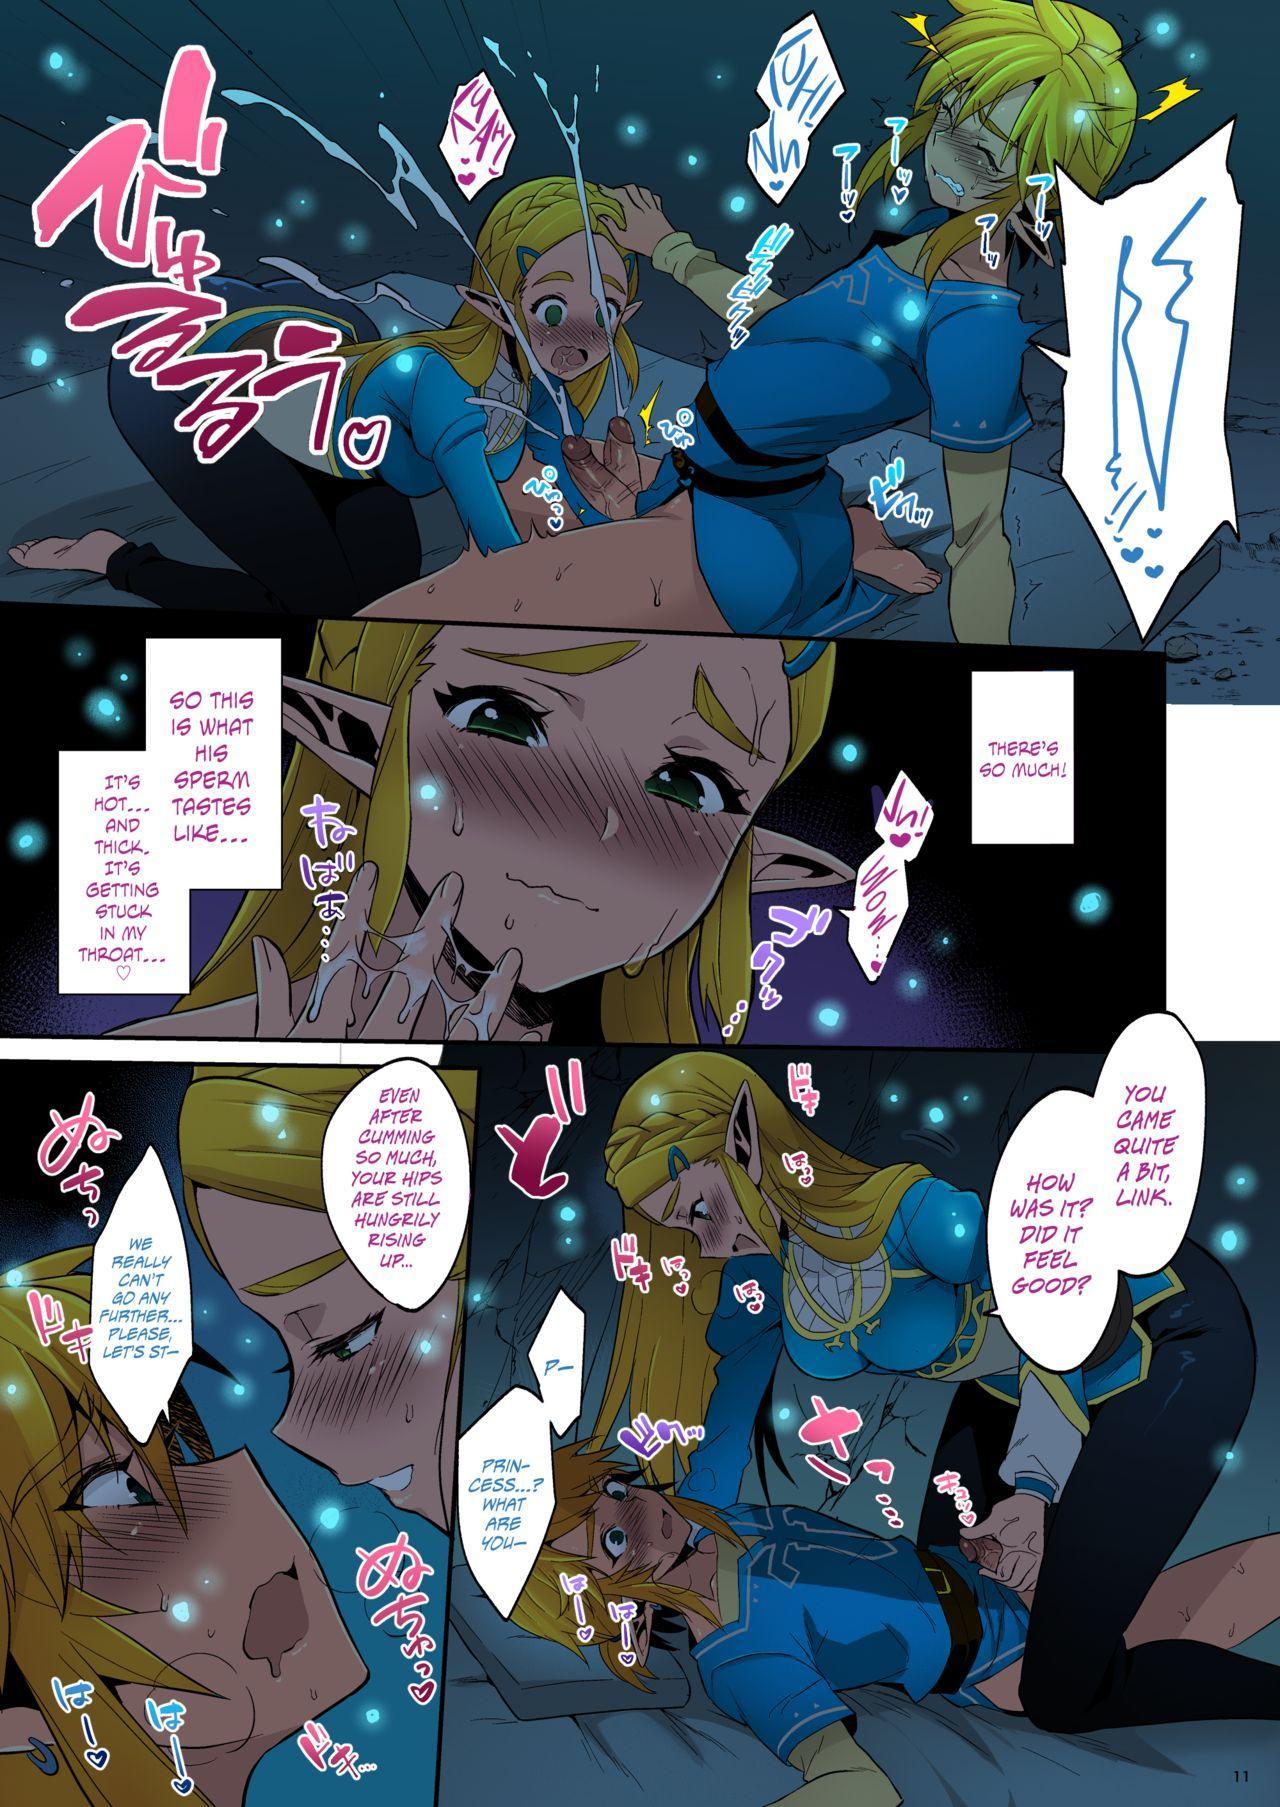 Hyrule Hanei no Tame no Katsudou!   Taking Steps to Ensure Hyrule's Prosperity! 11